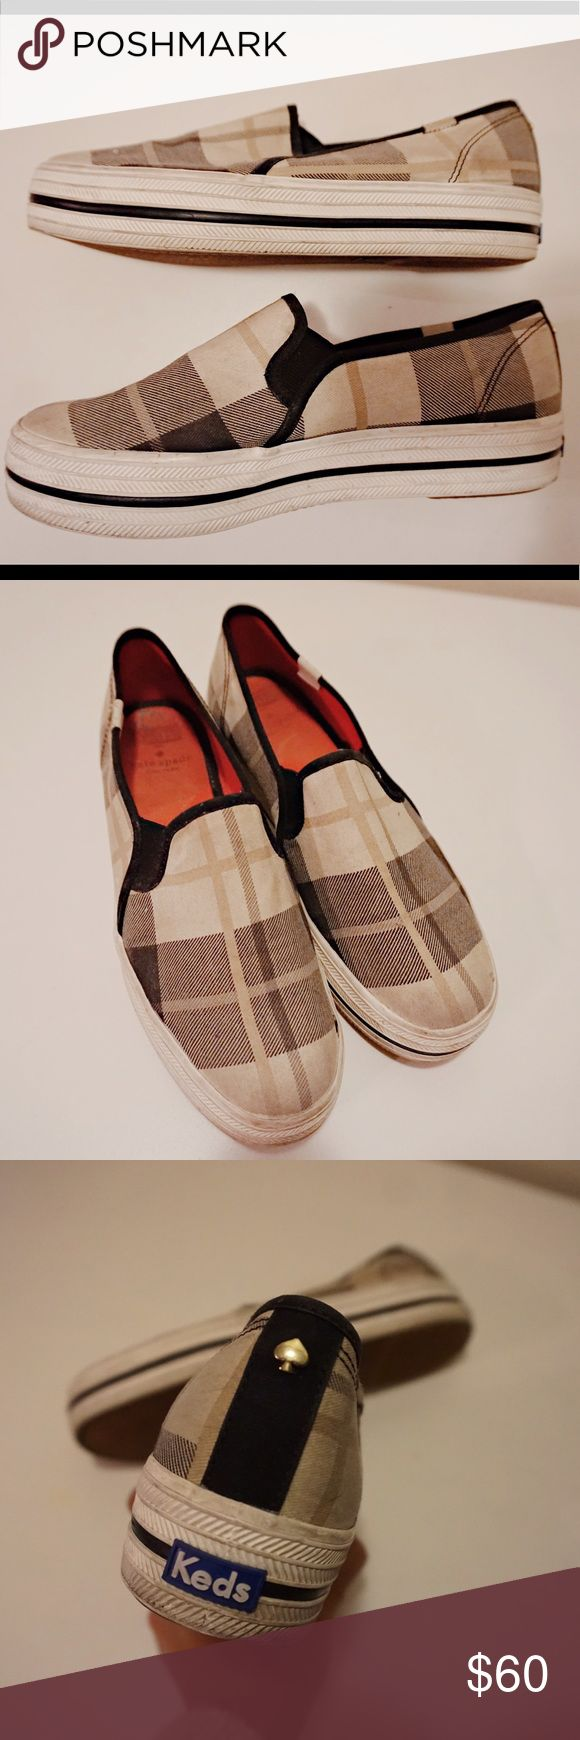 Kate Spade Keds Sneakers Kate Spade ♠️ keds sneakers. Need to be cleaned! kate spade Shoes Sneakers